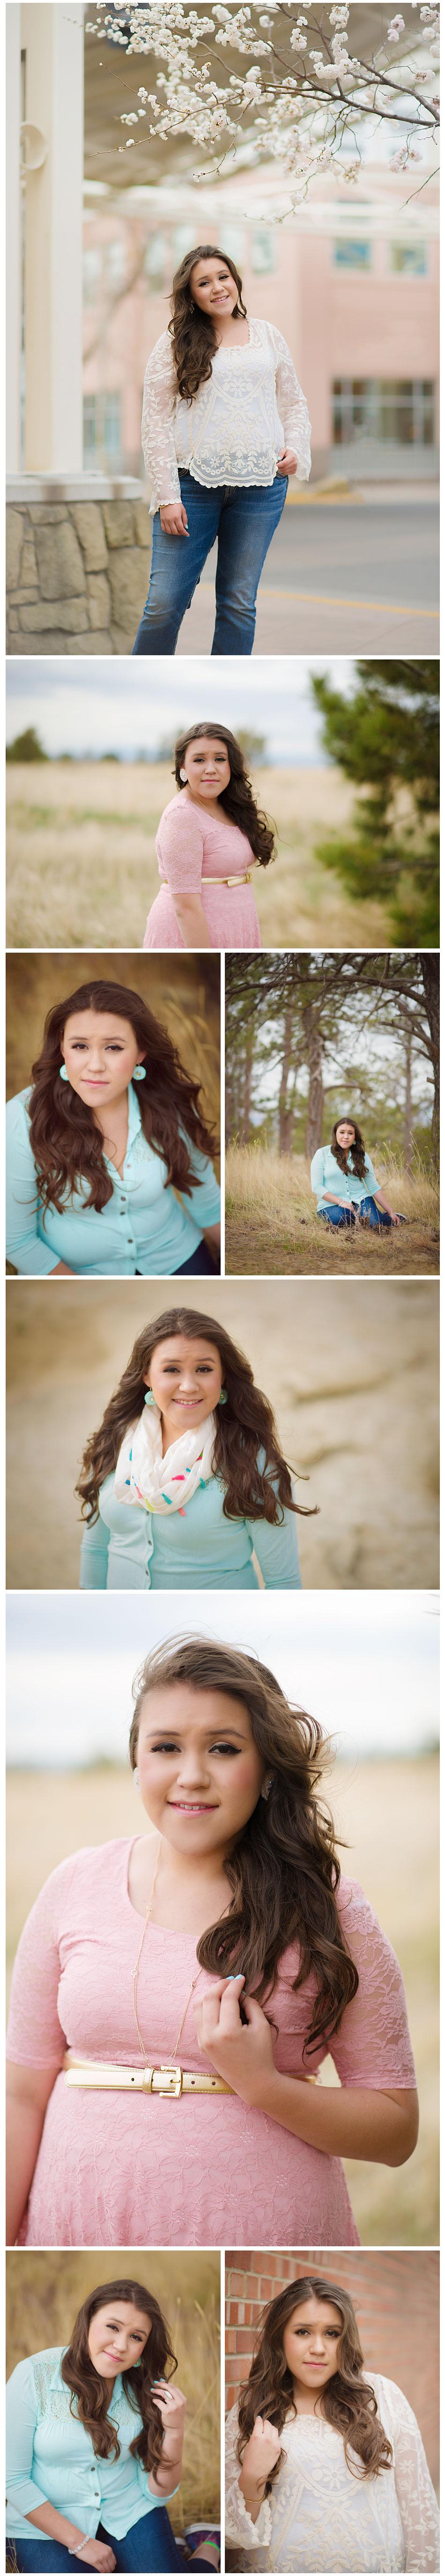 senior-photographer-montana.jpg